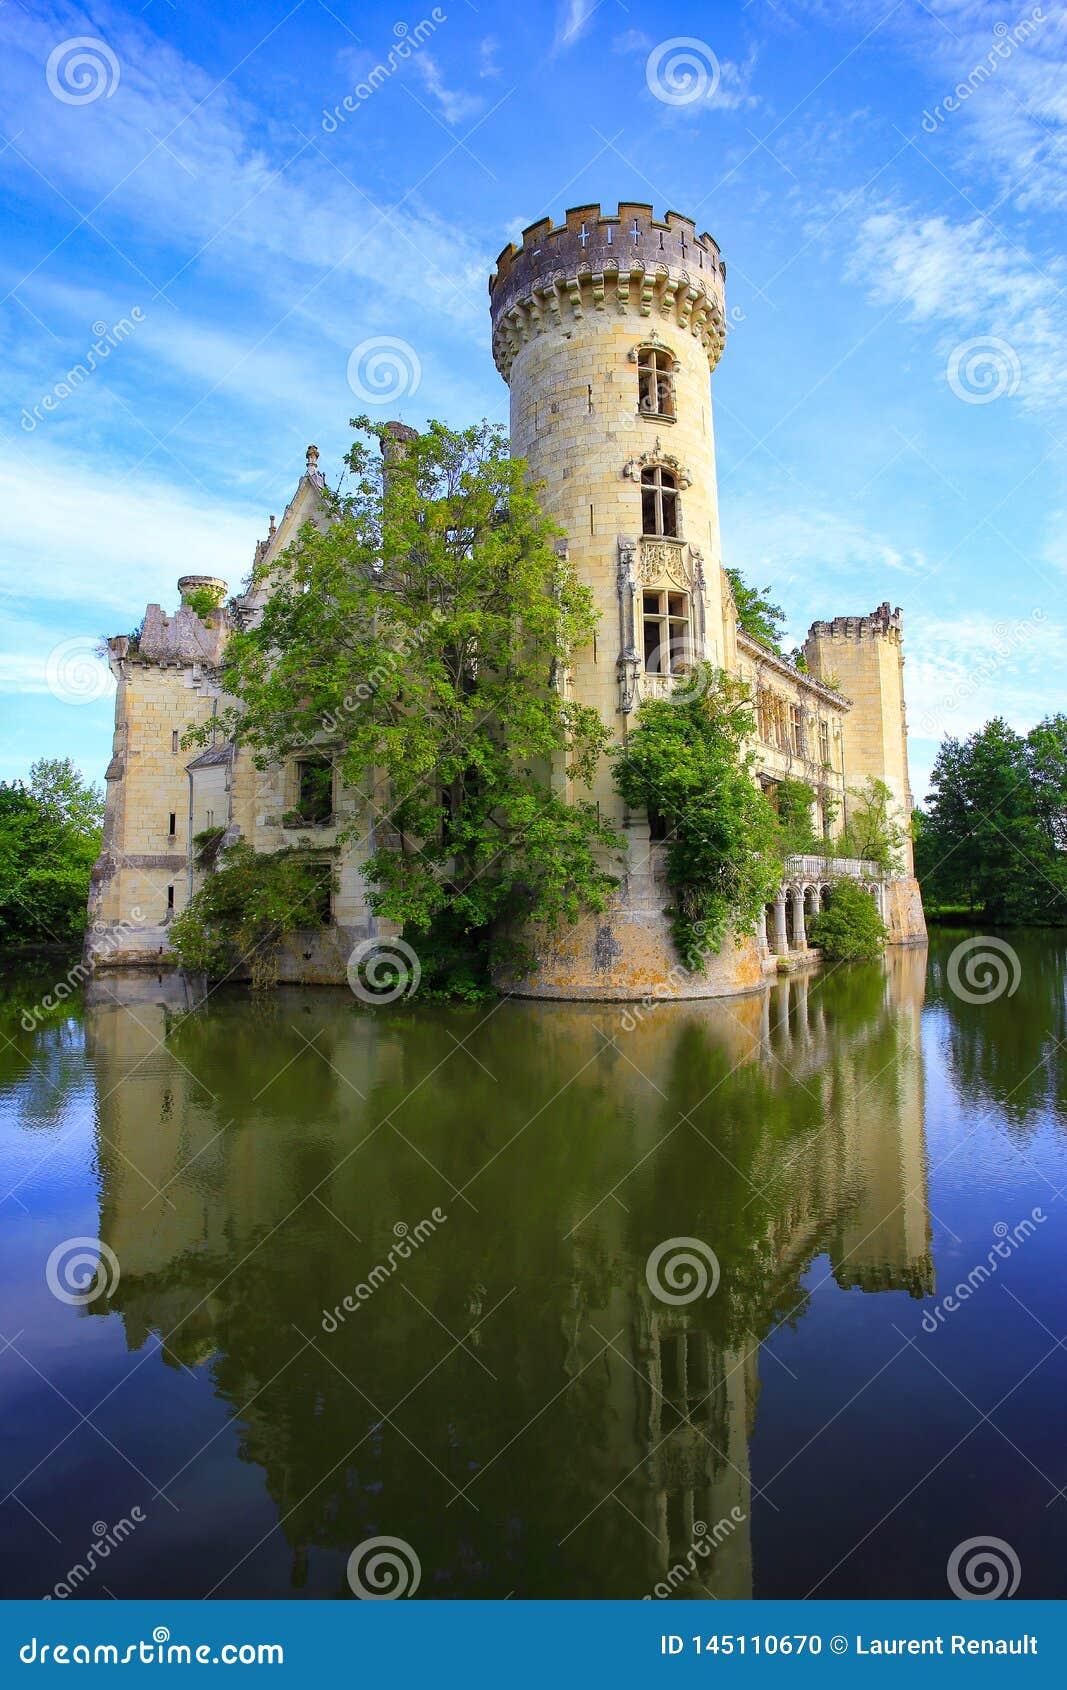 La Mothe Chandeniers, fairytale ruin of a french castle